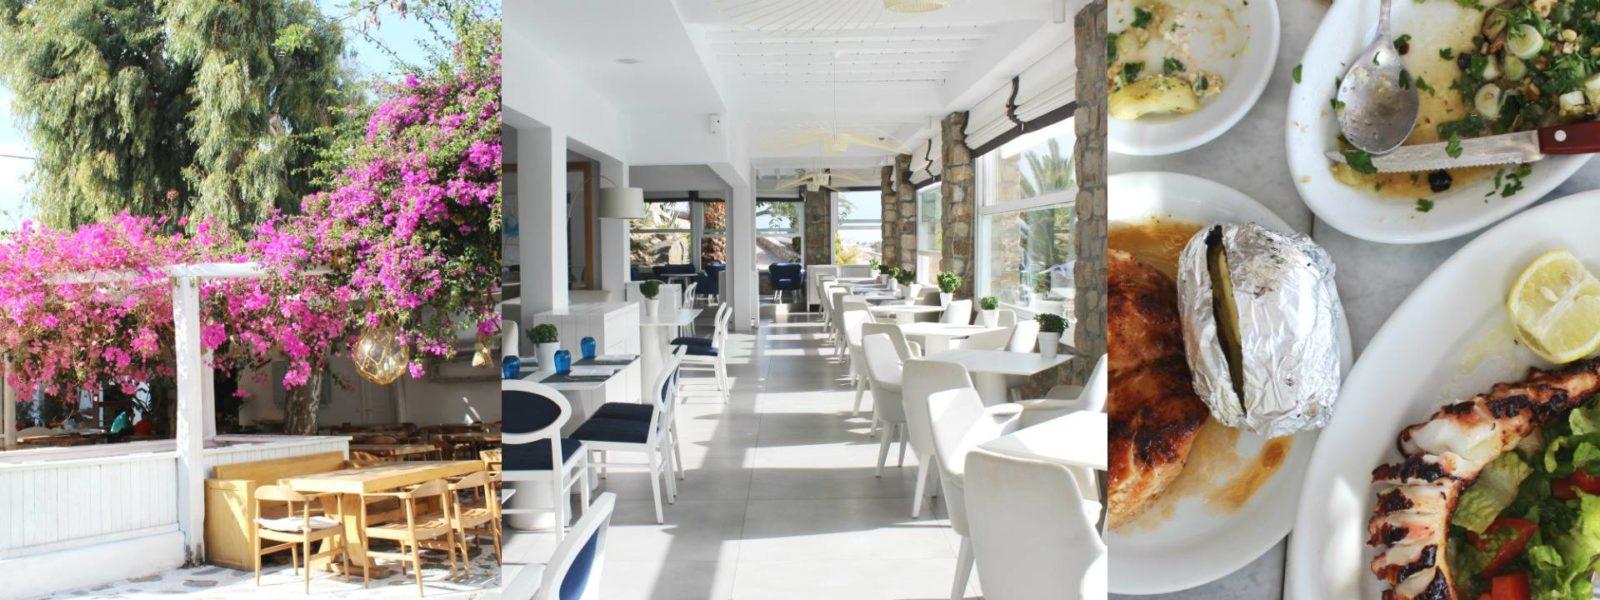 #LTgreekweek // the lazy girls' guide to off-season dining in mykonos